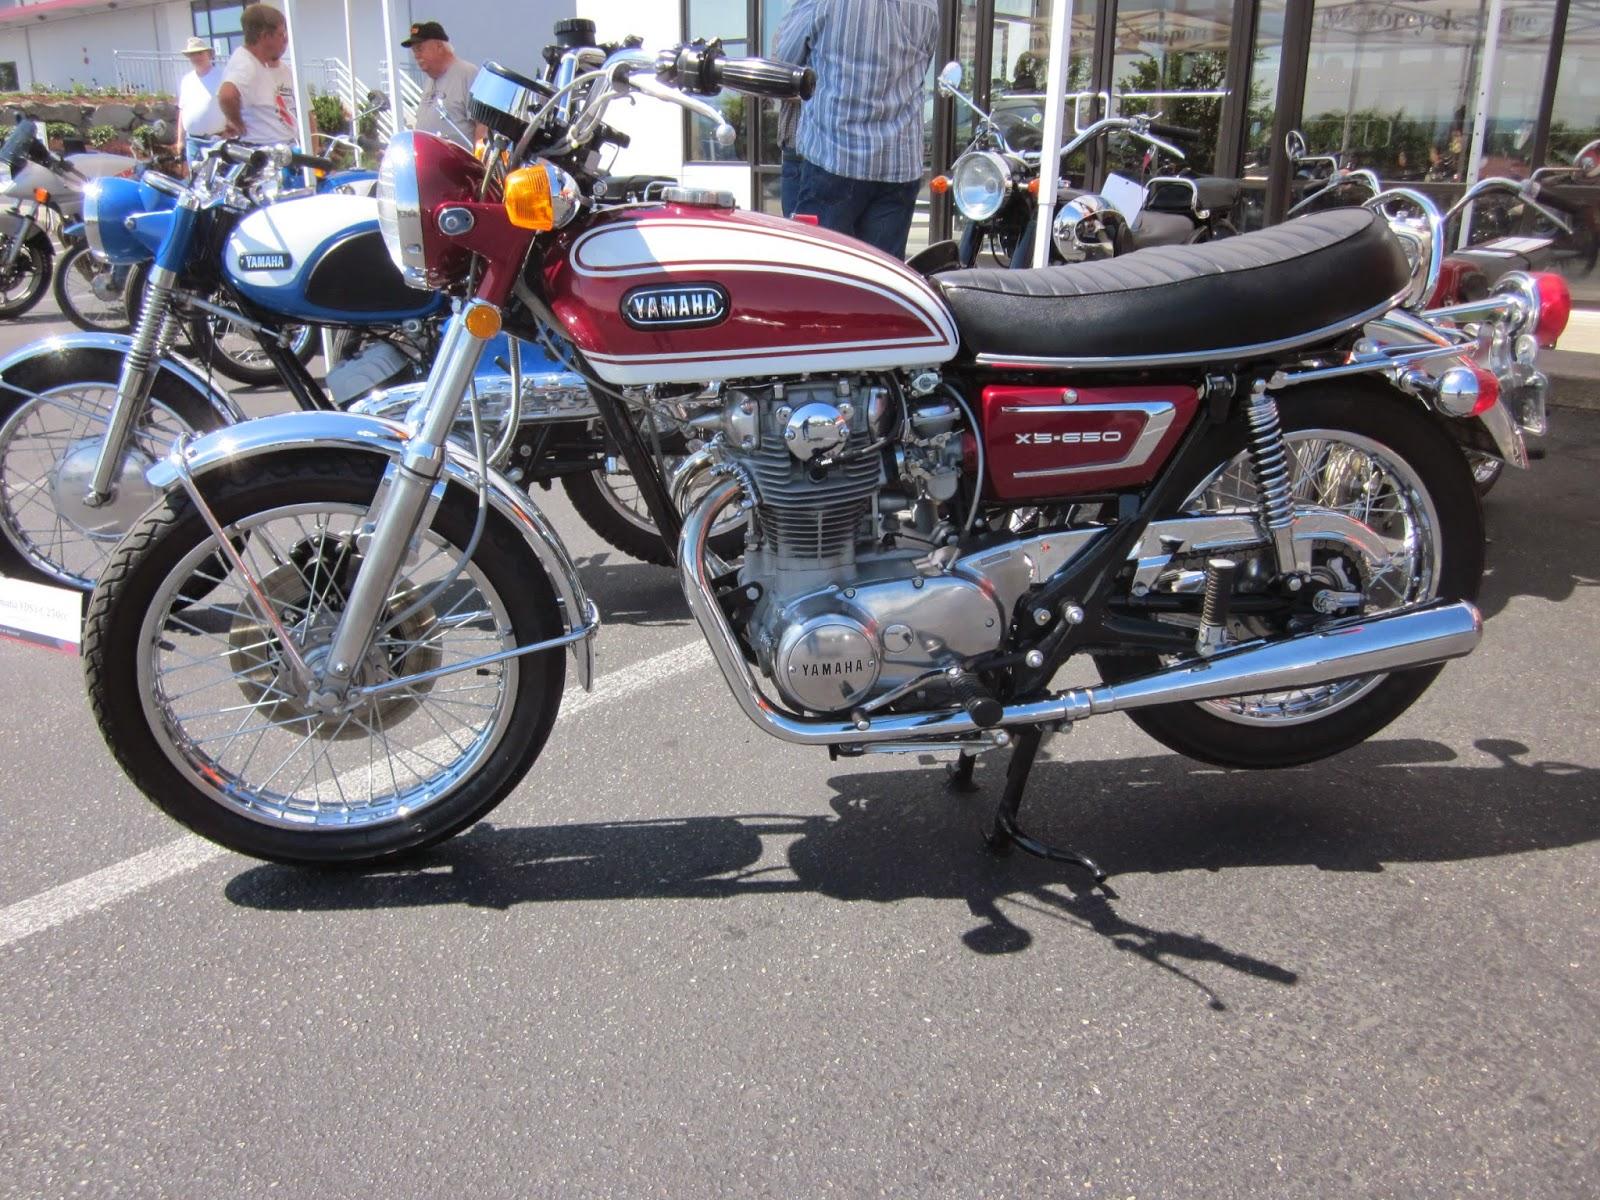 Oldmotodude yamaha xs2 650 on display at the 2014 vjmc for Hinshaw honda auburn wa